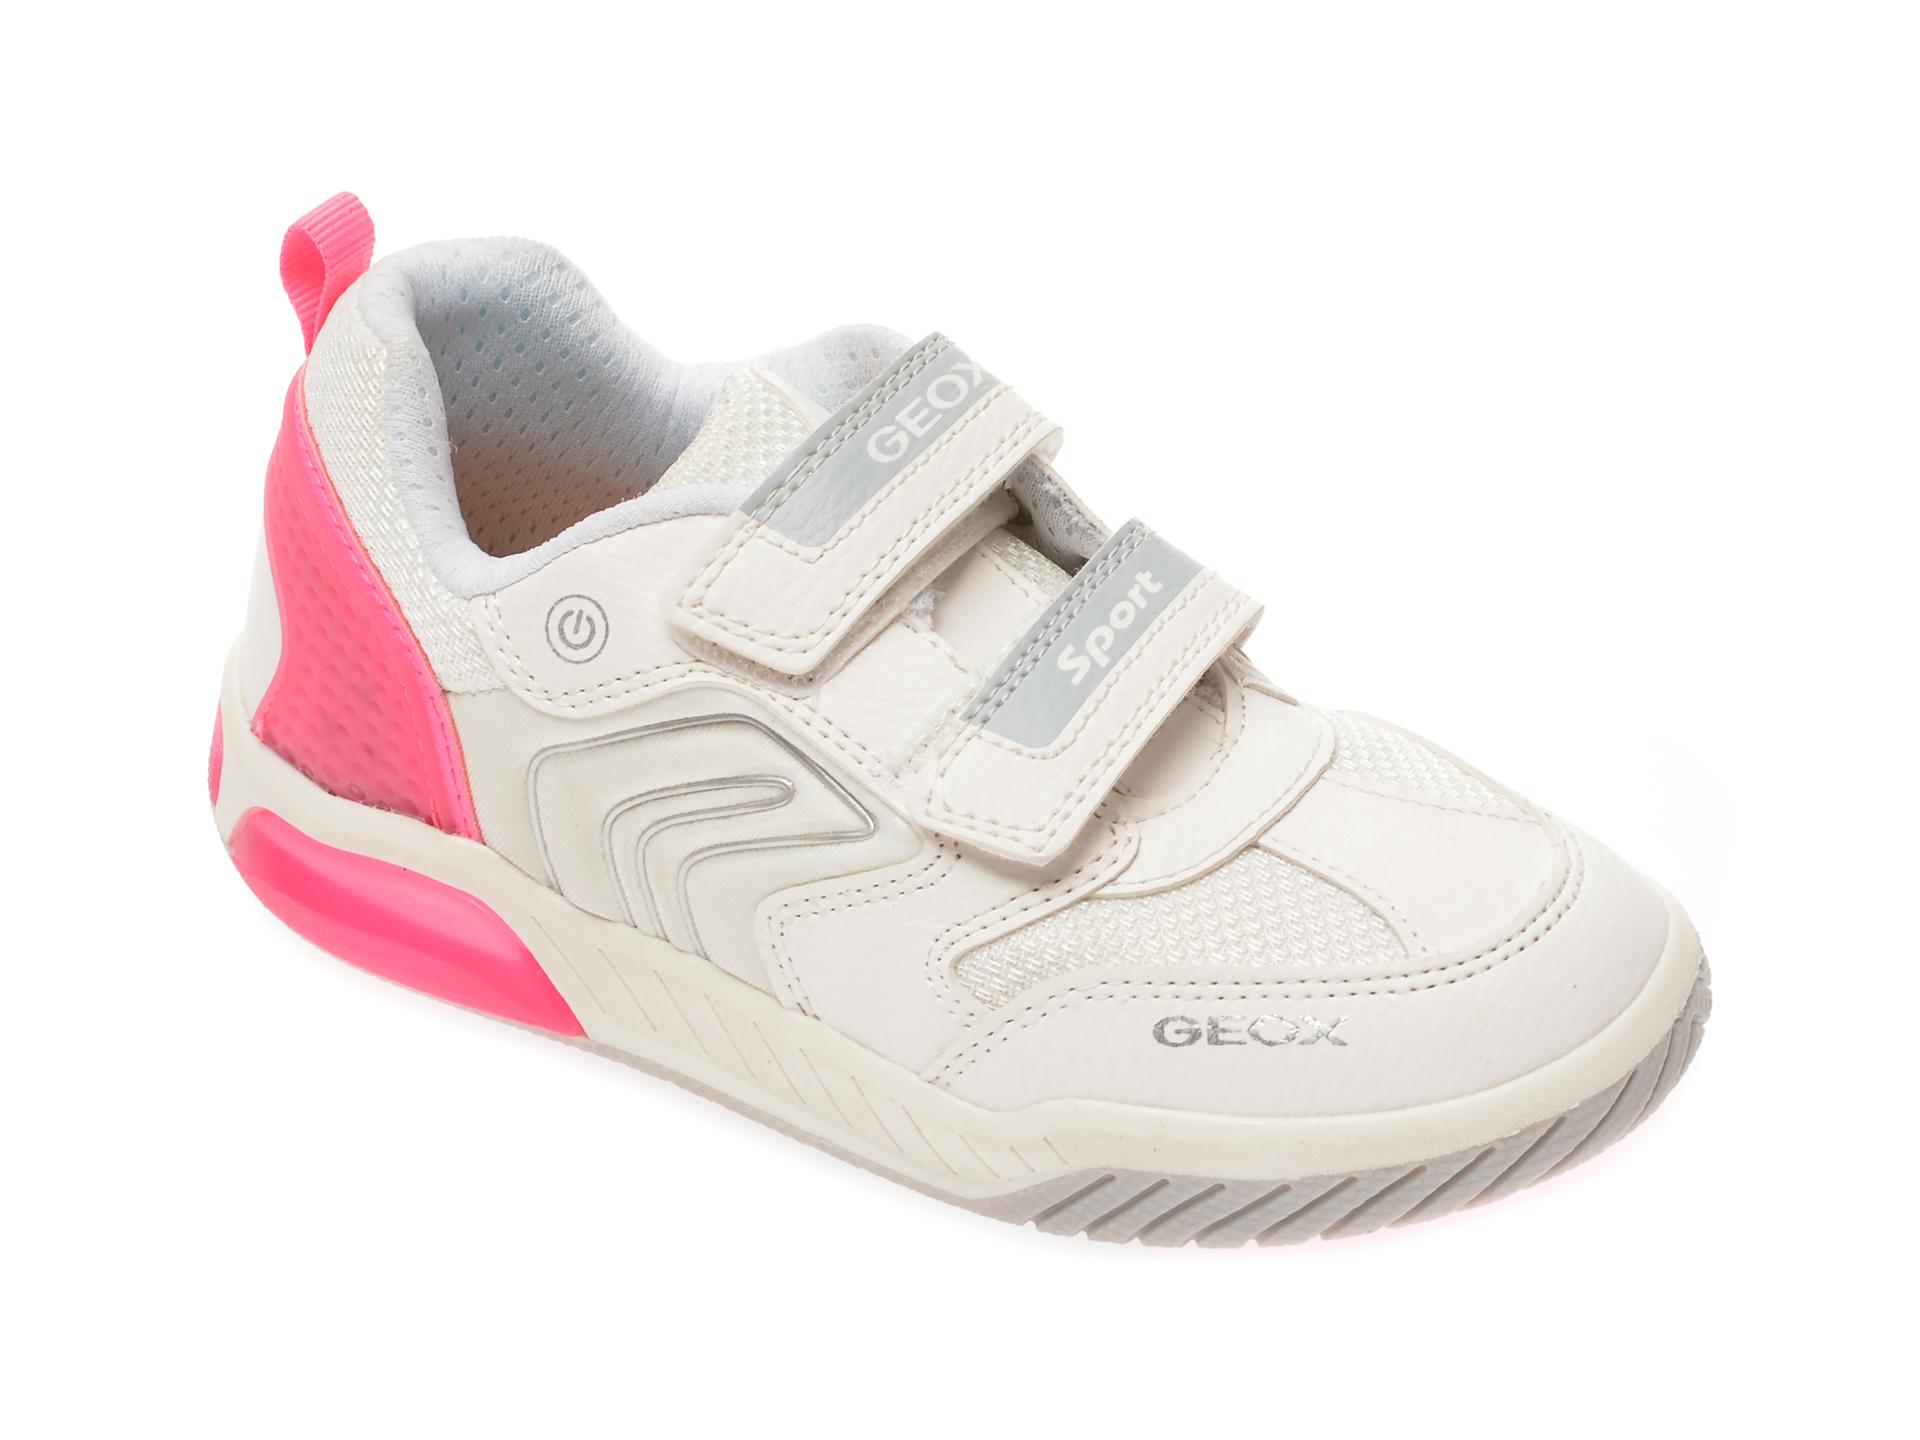 Pantofi sport GEOX albi, J02ASA, din material textil si piele ecologica New